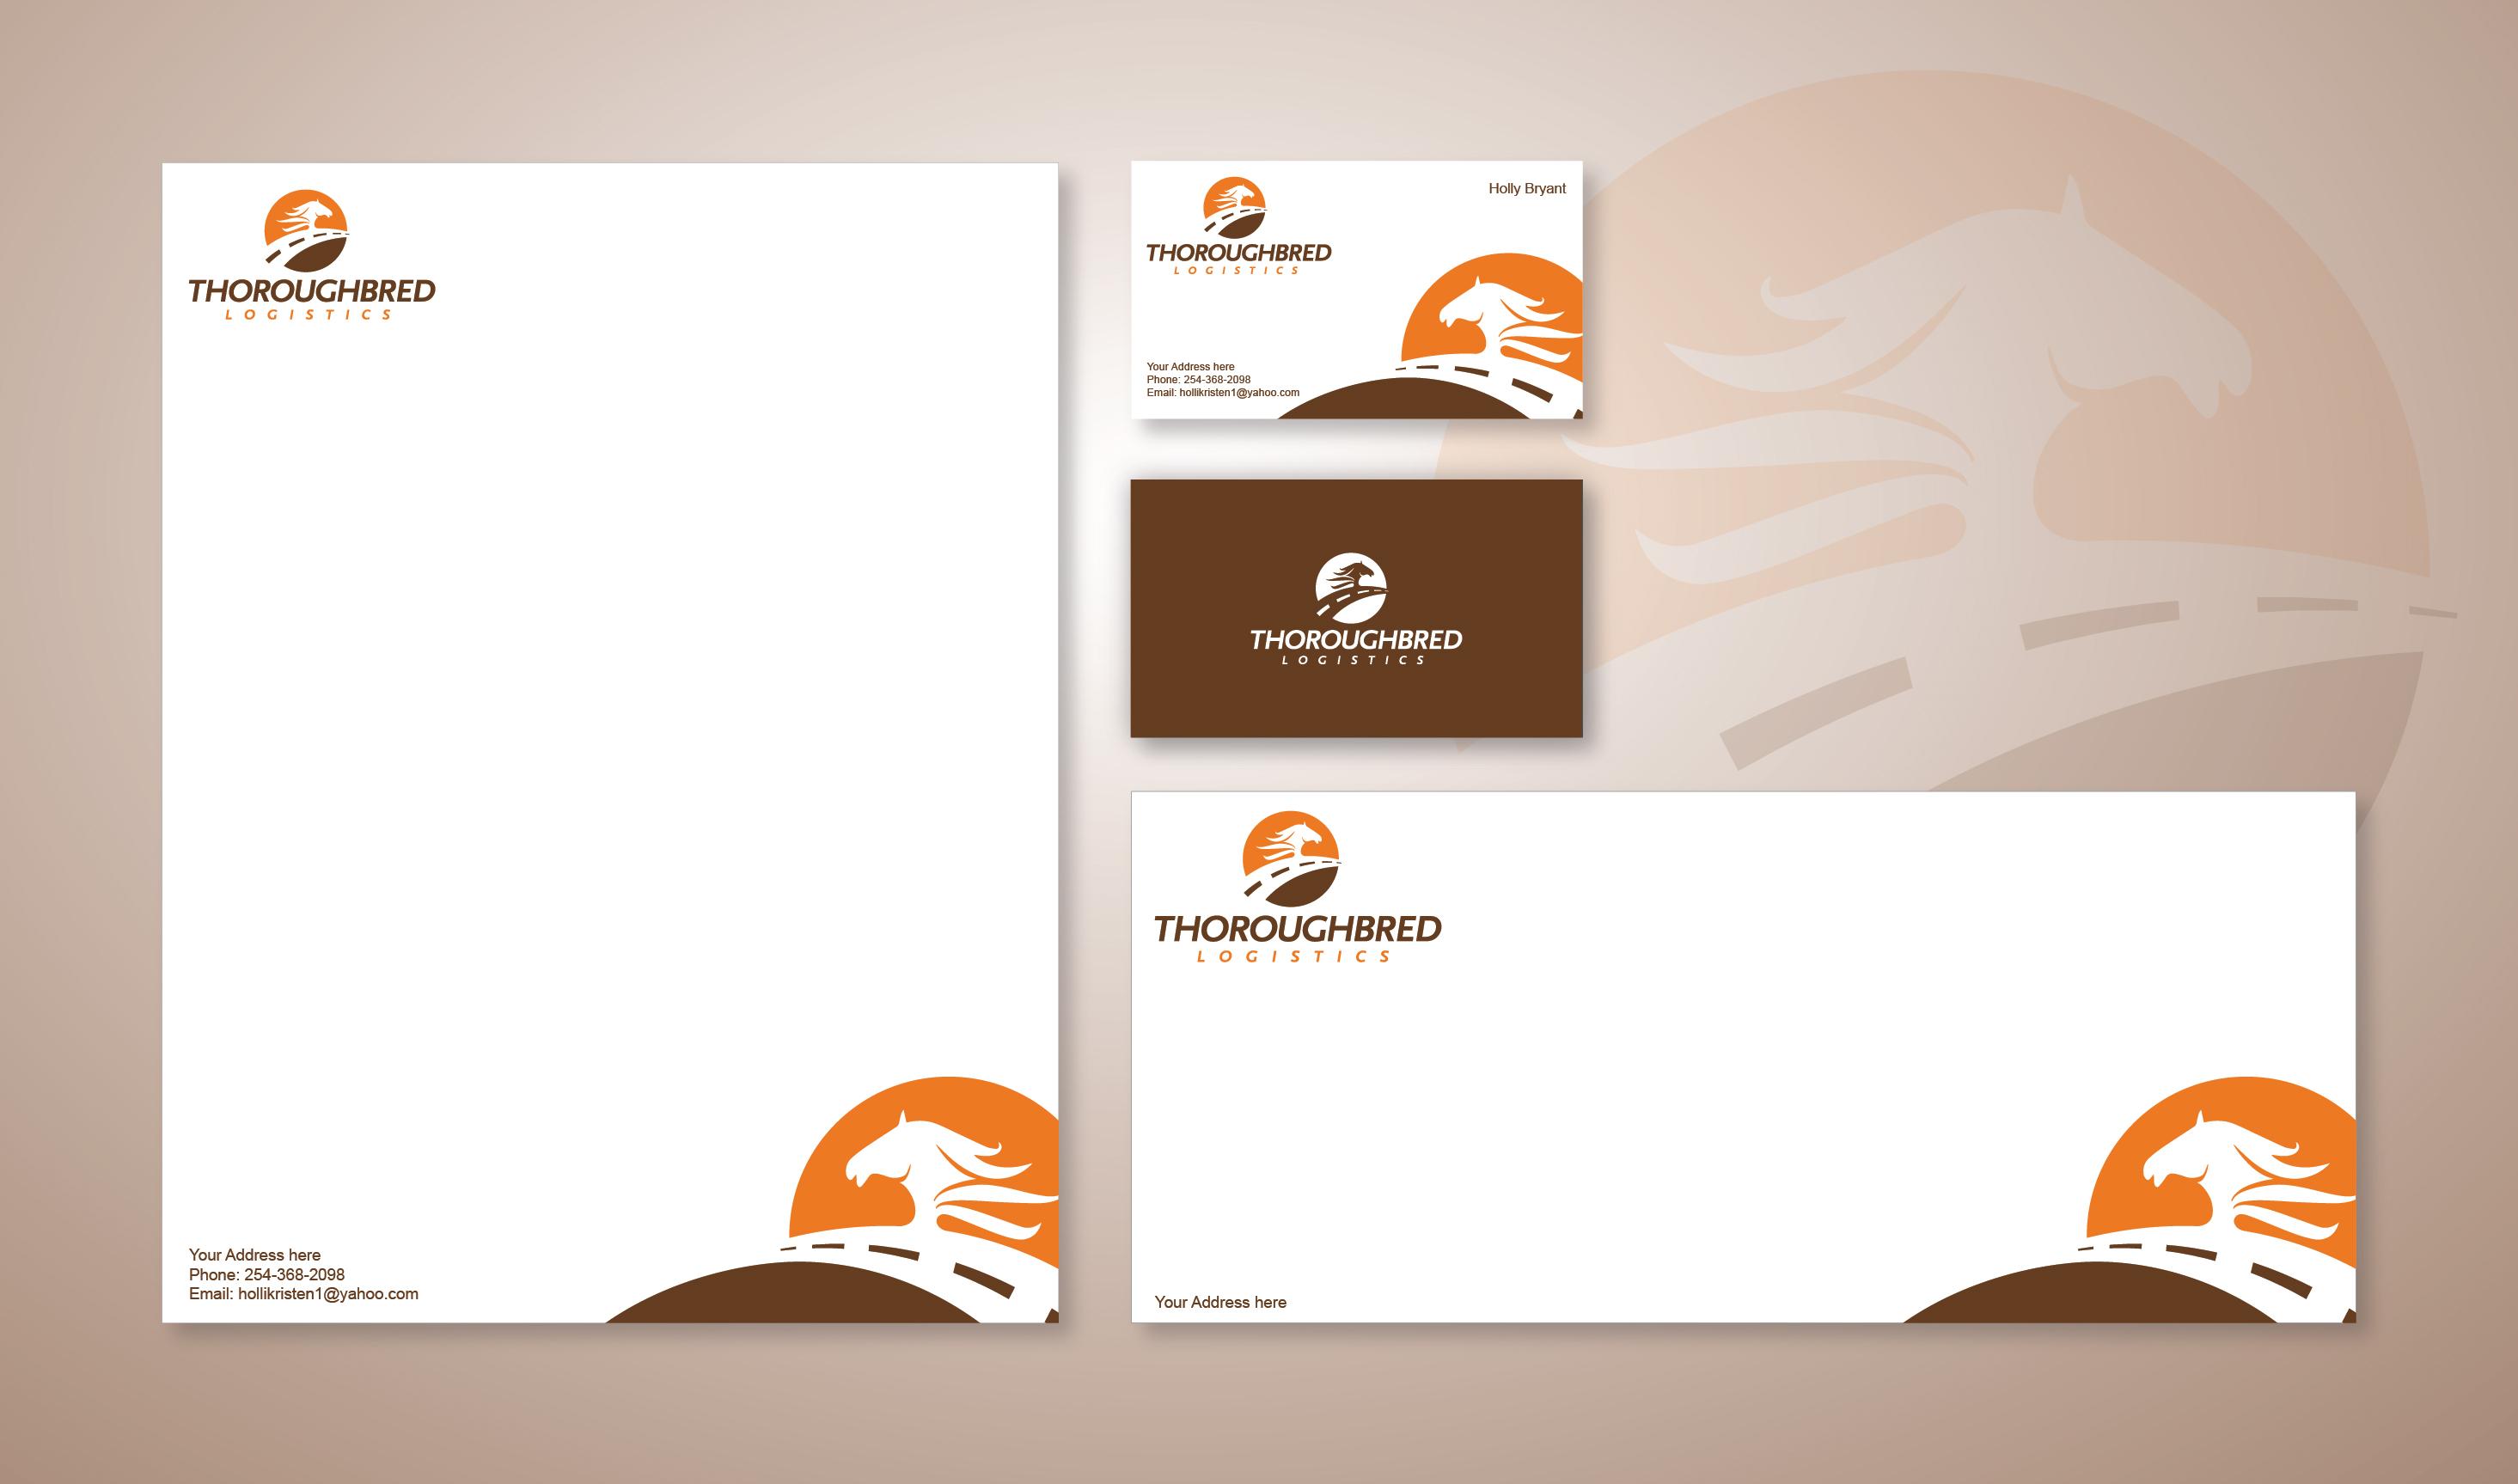 Stationery Design Template for Thoroughbred Logistics - Logo Design Deck